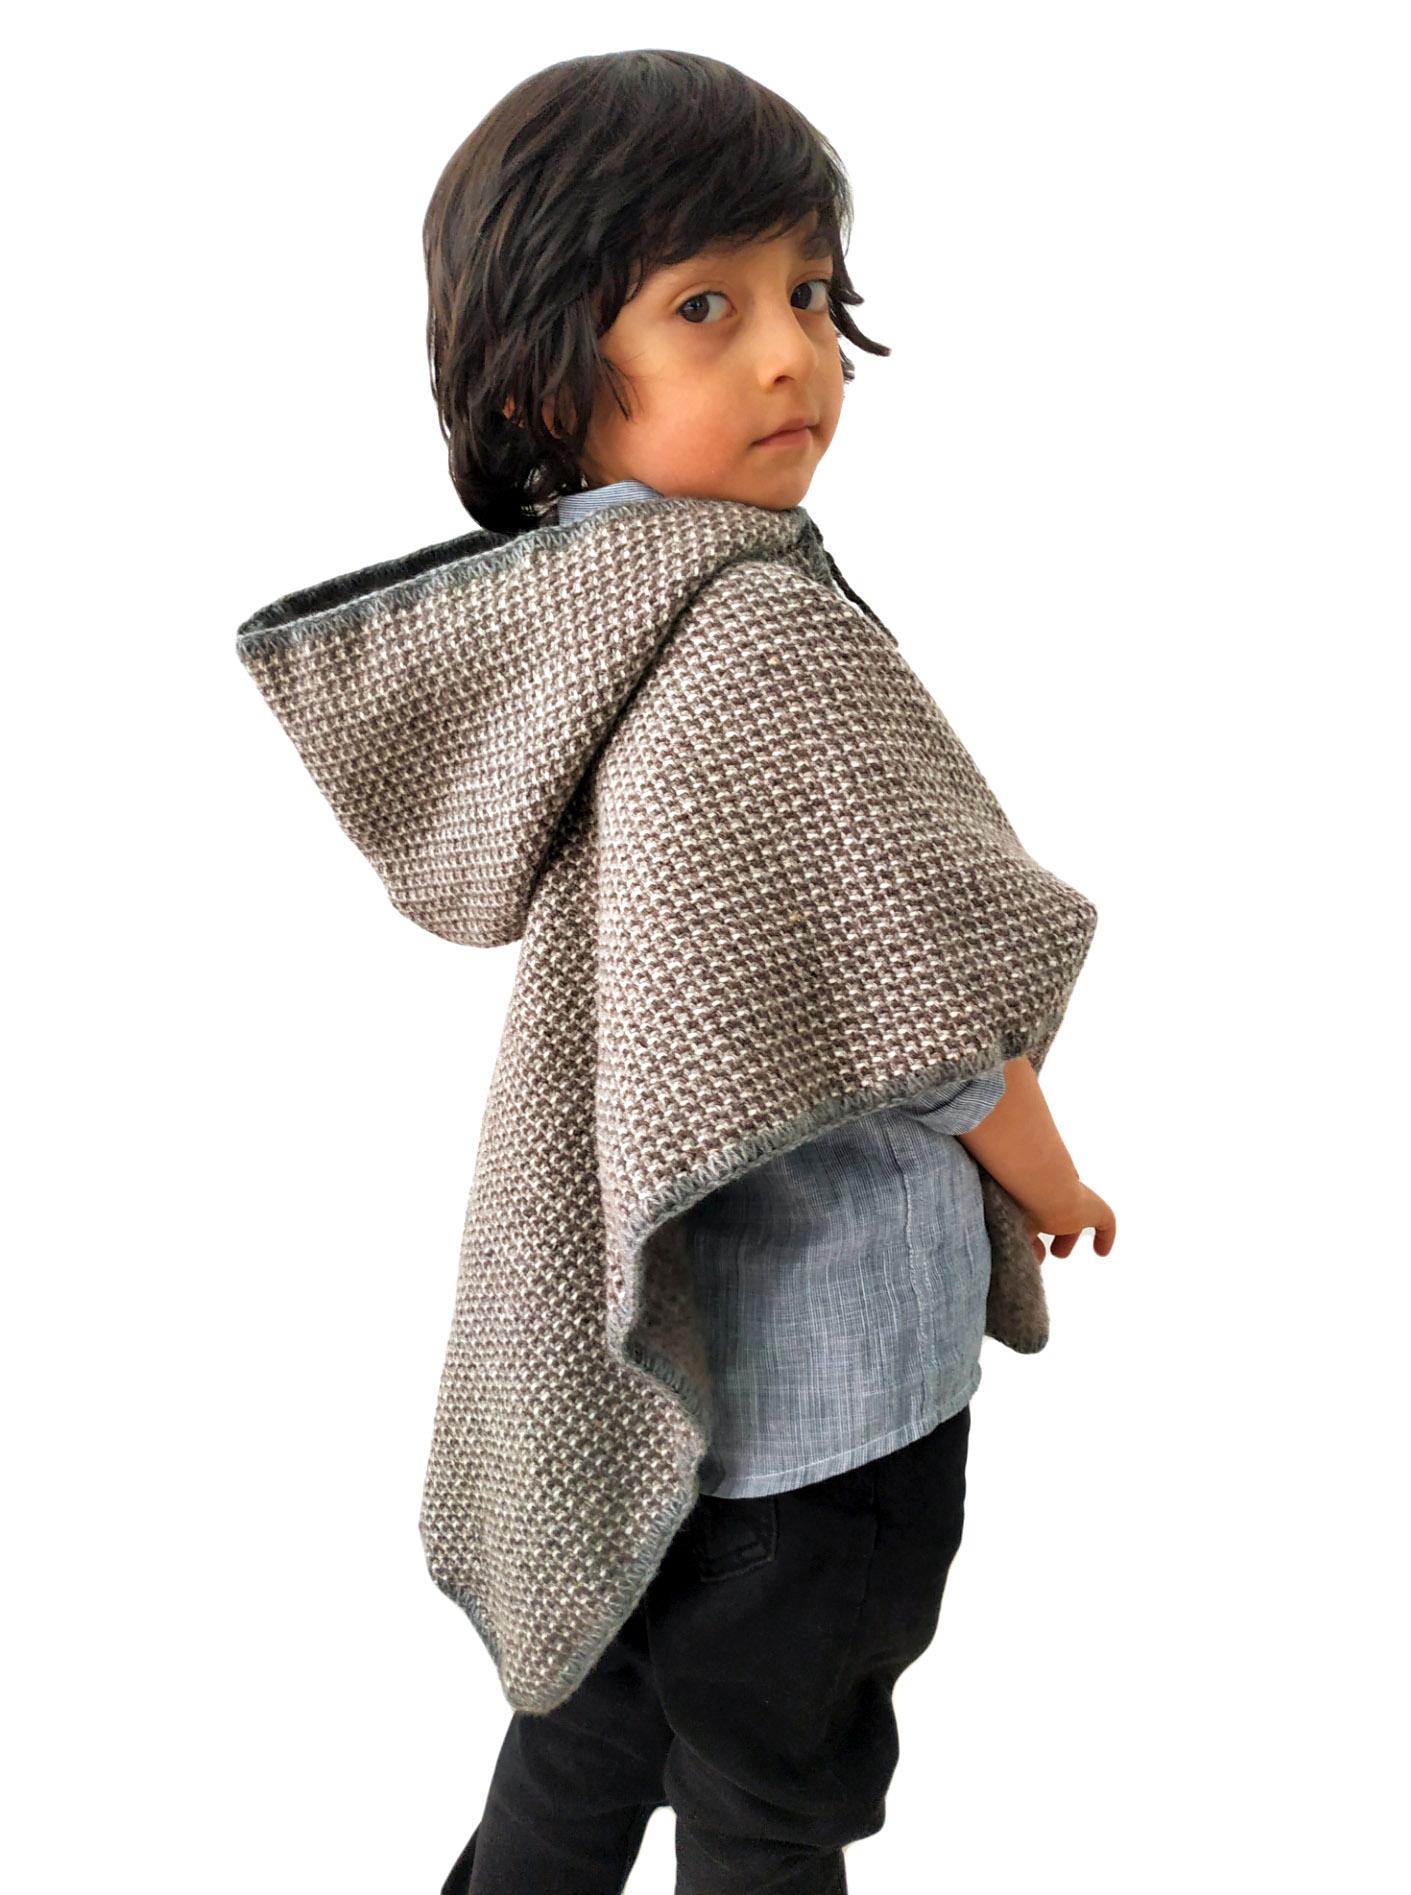 Ruana con capota para niños